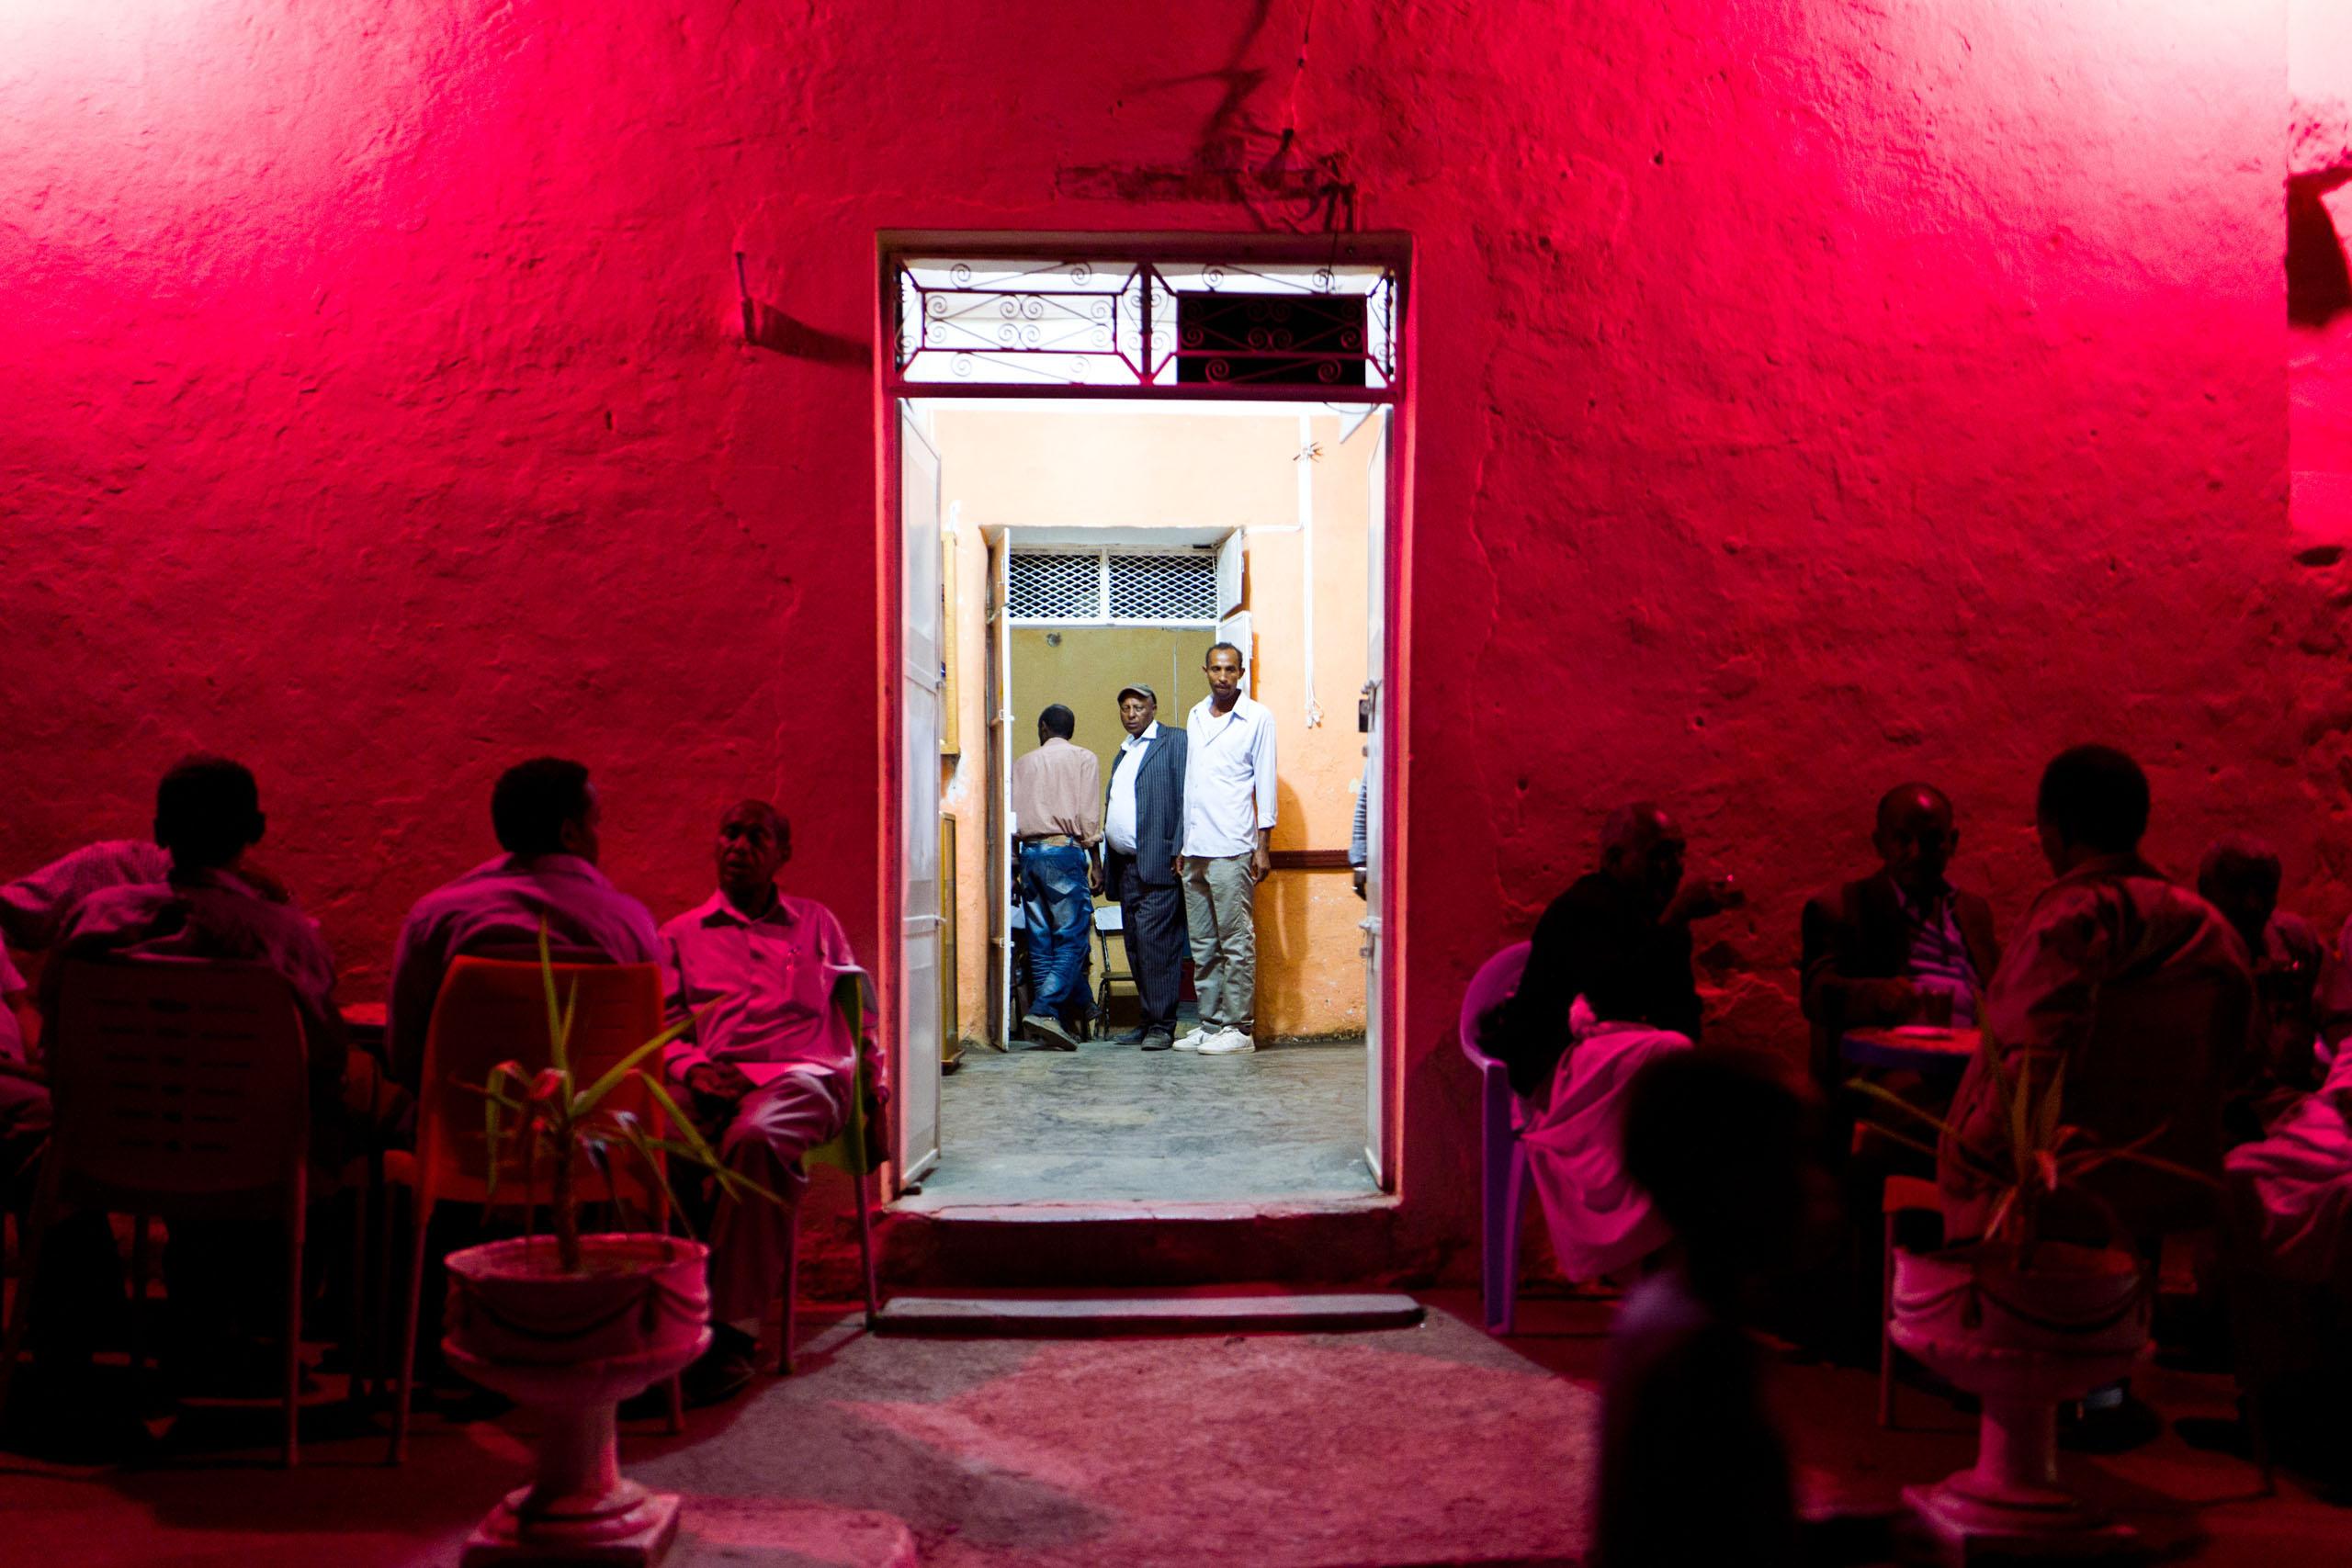 A night bar in the city of Keren, Eritrea.